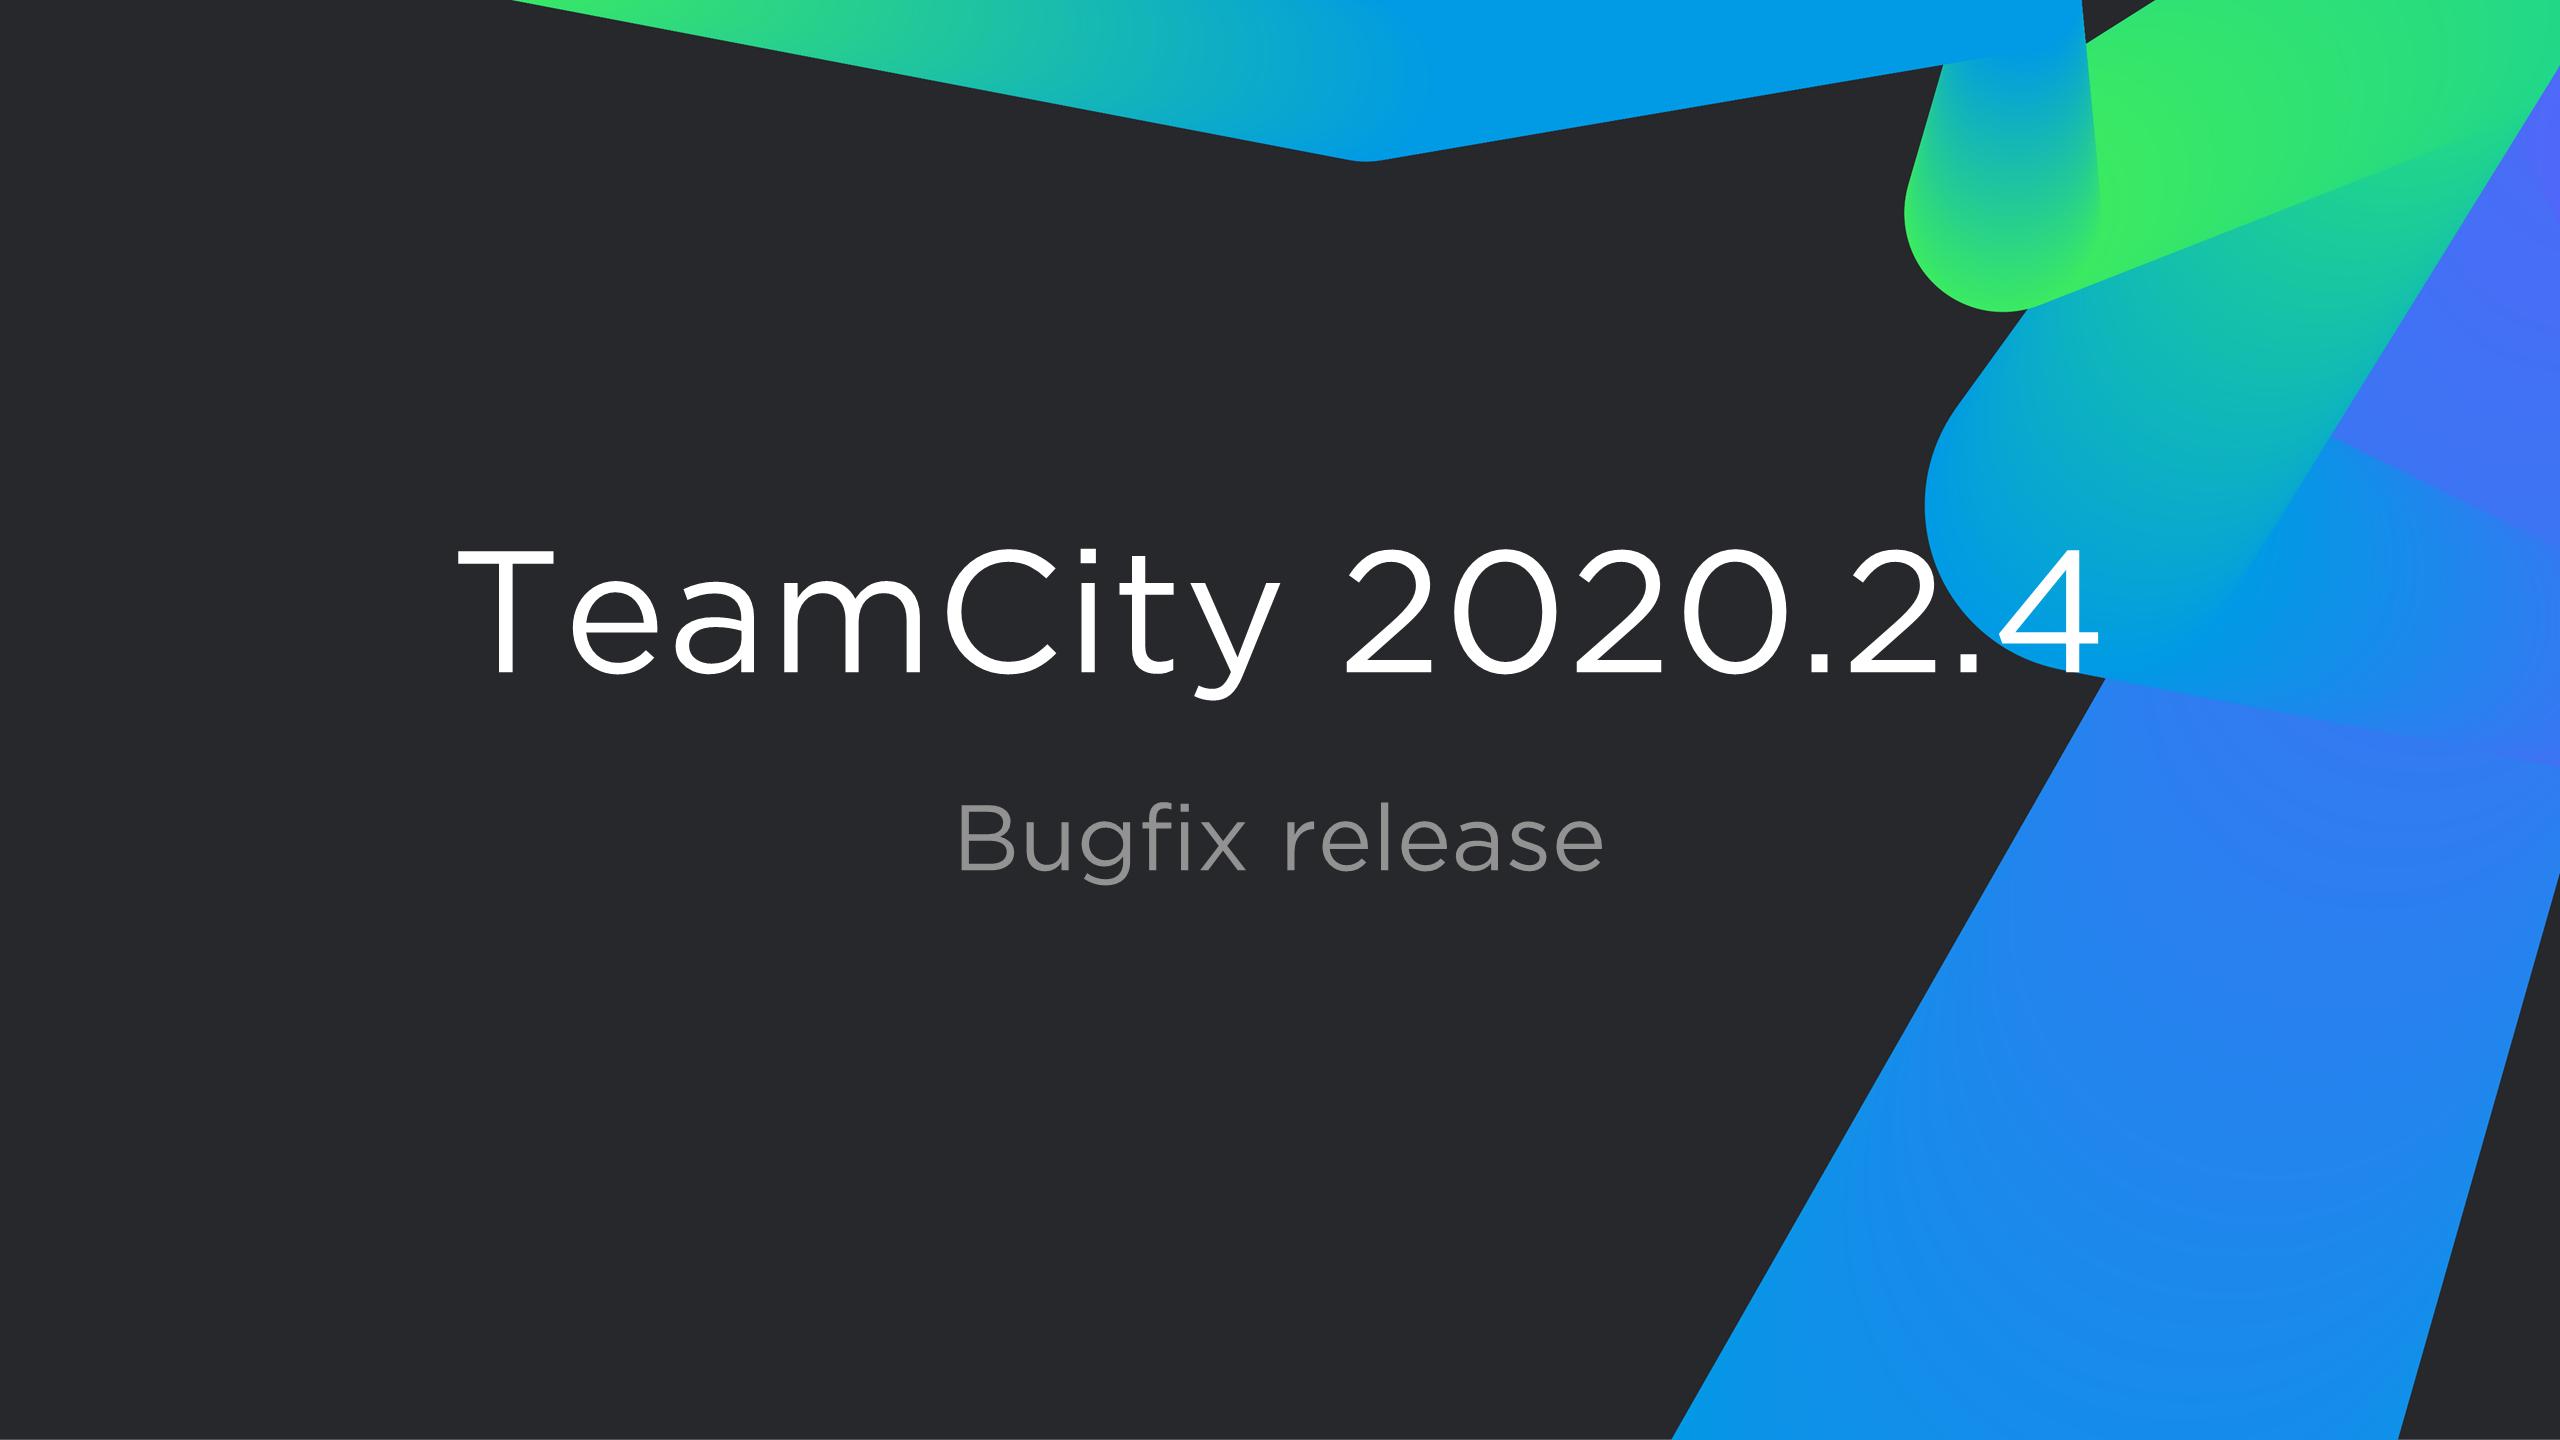 TeamCity 2020.2.4